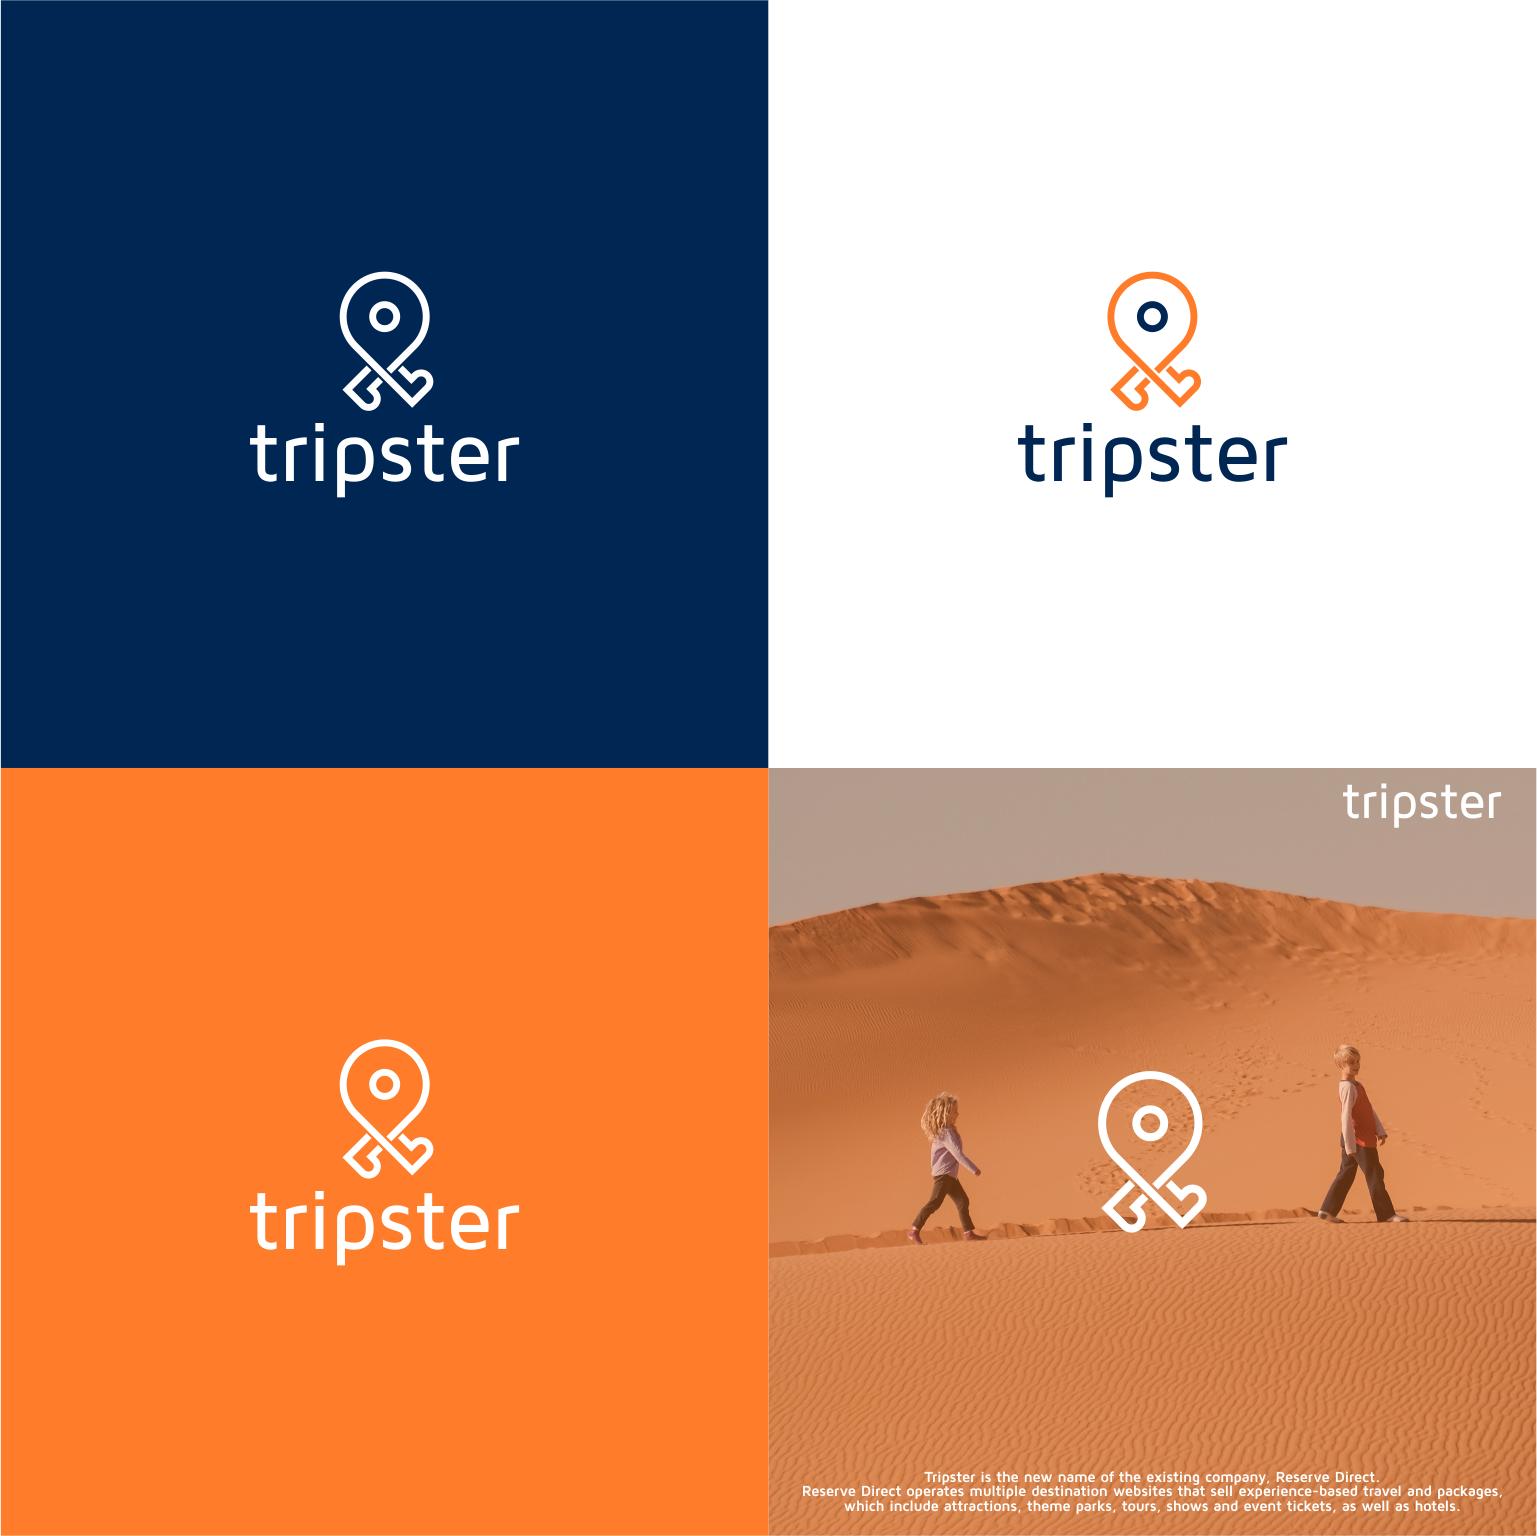 Tripster logo